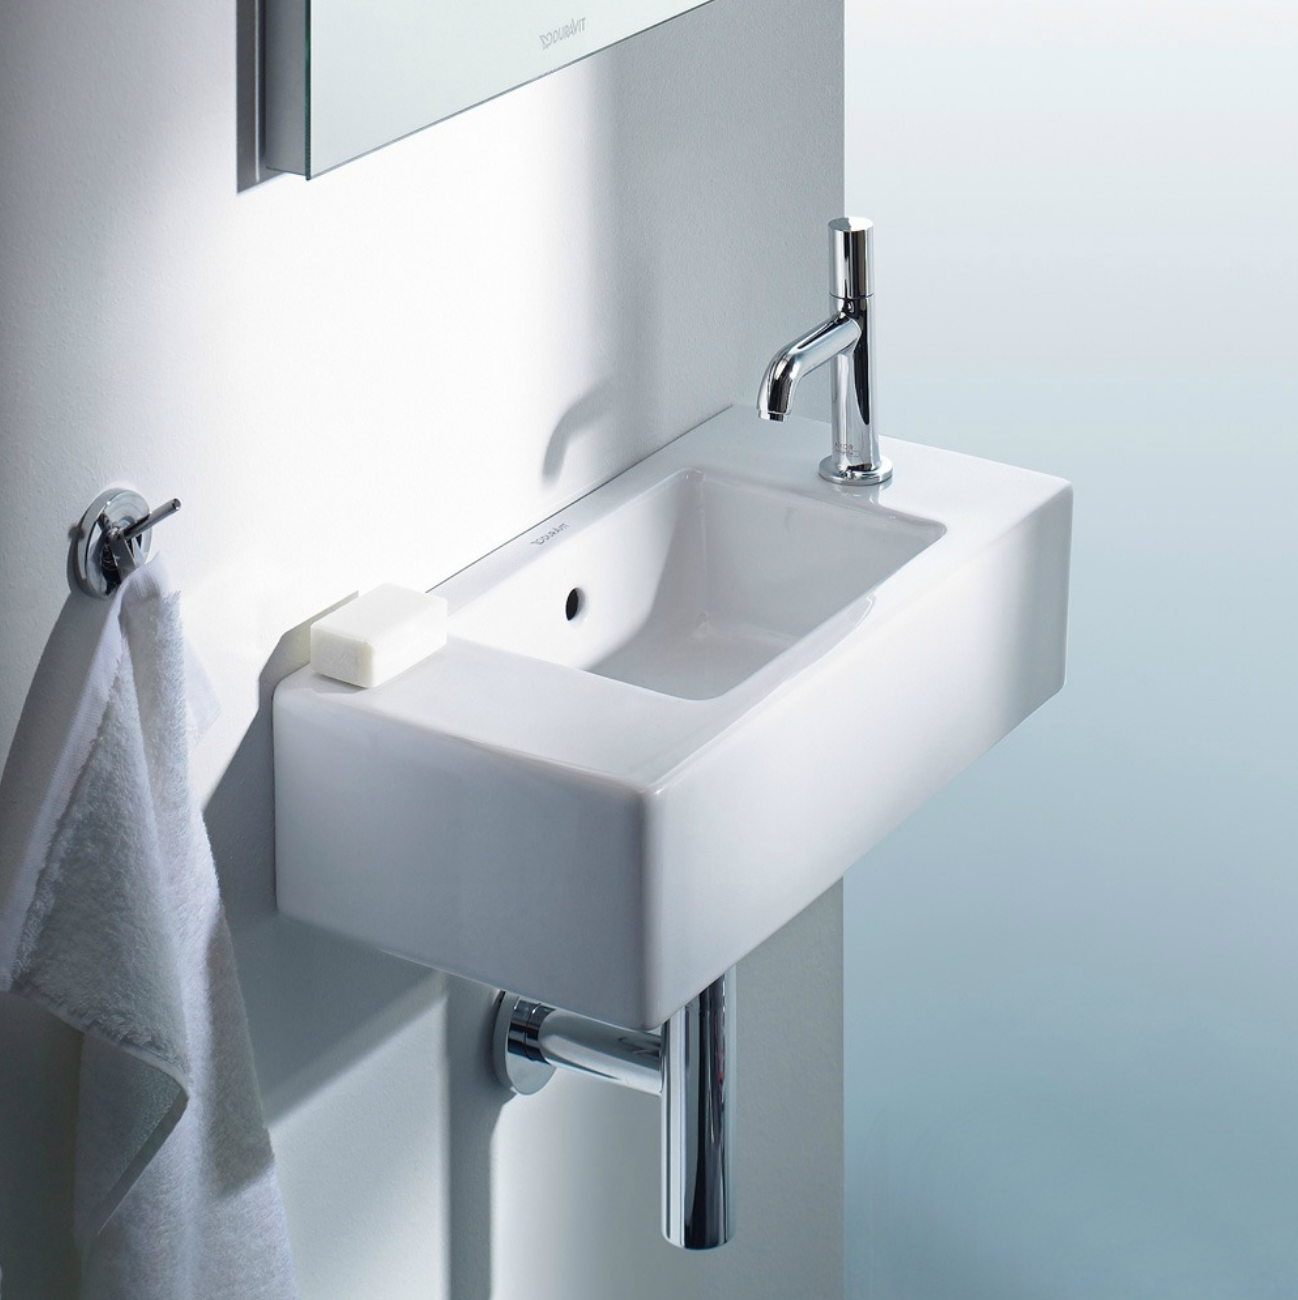 duravit sink.png